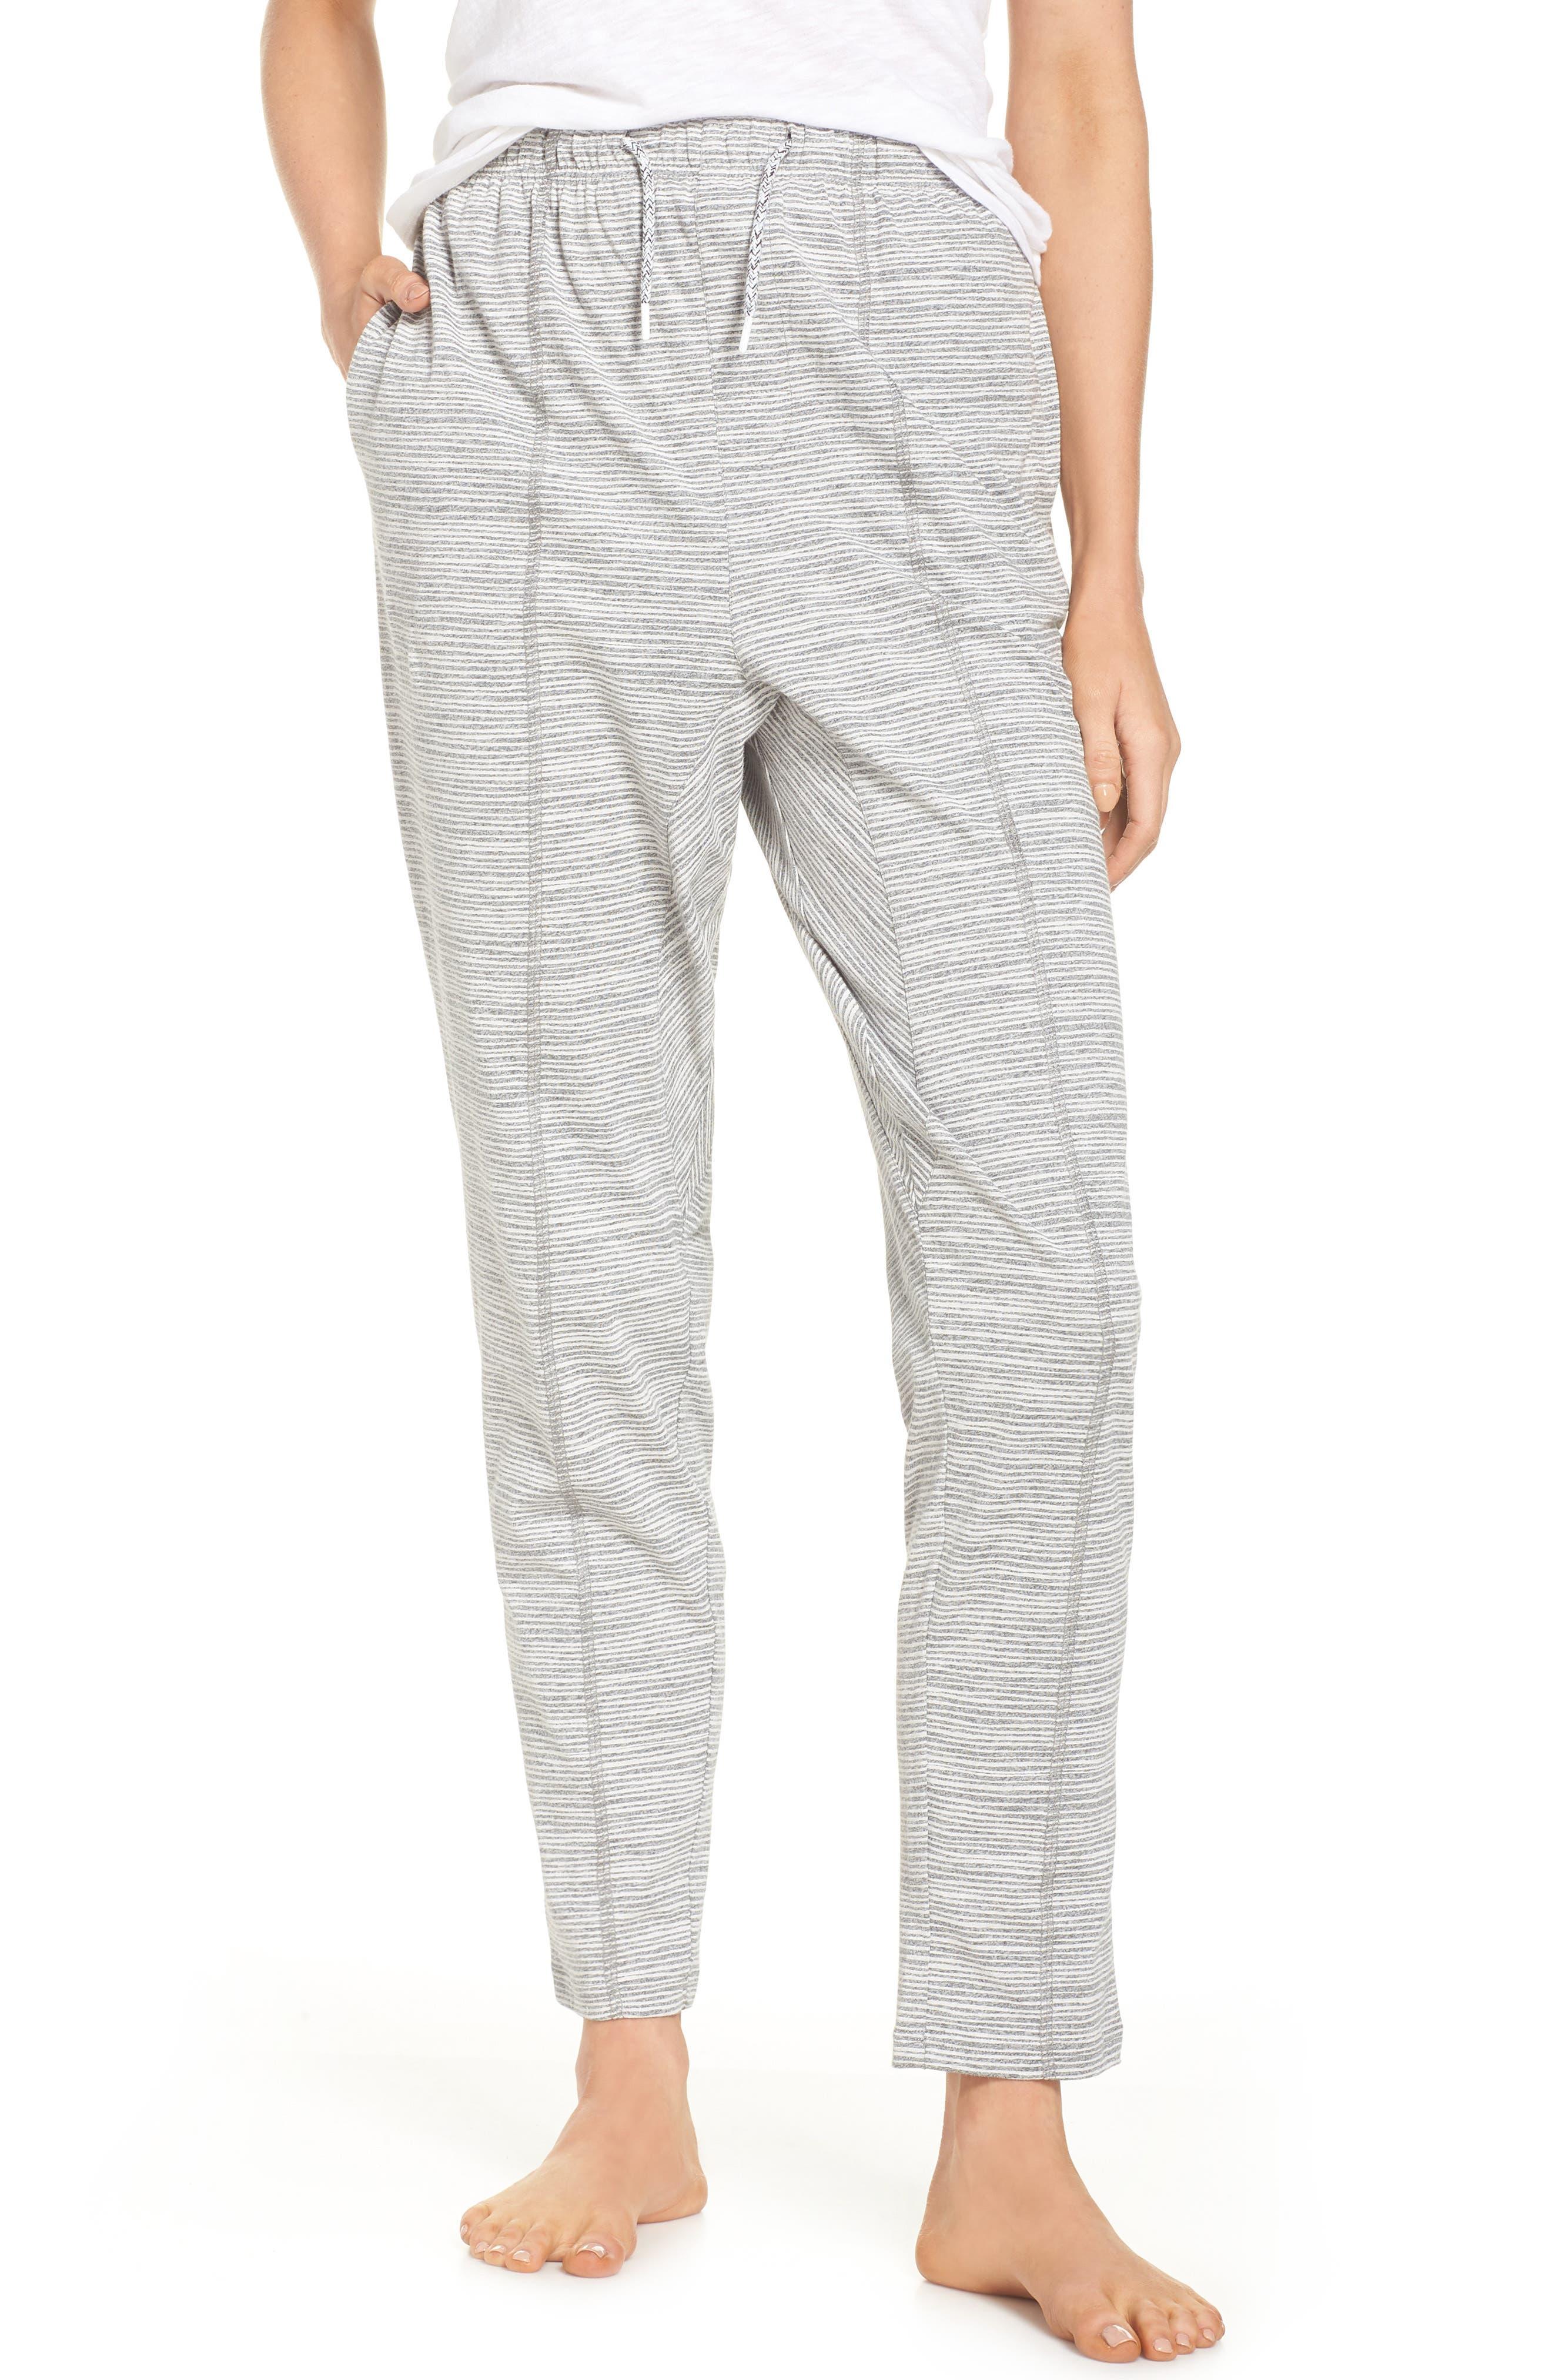 CHALMERS,                             Ash Stripe Lounge Pants,                             Main thumbnail 1, color,                             033